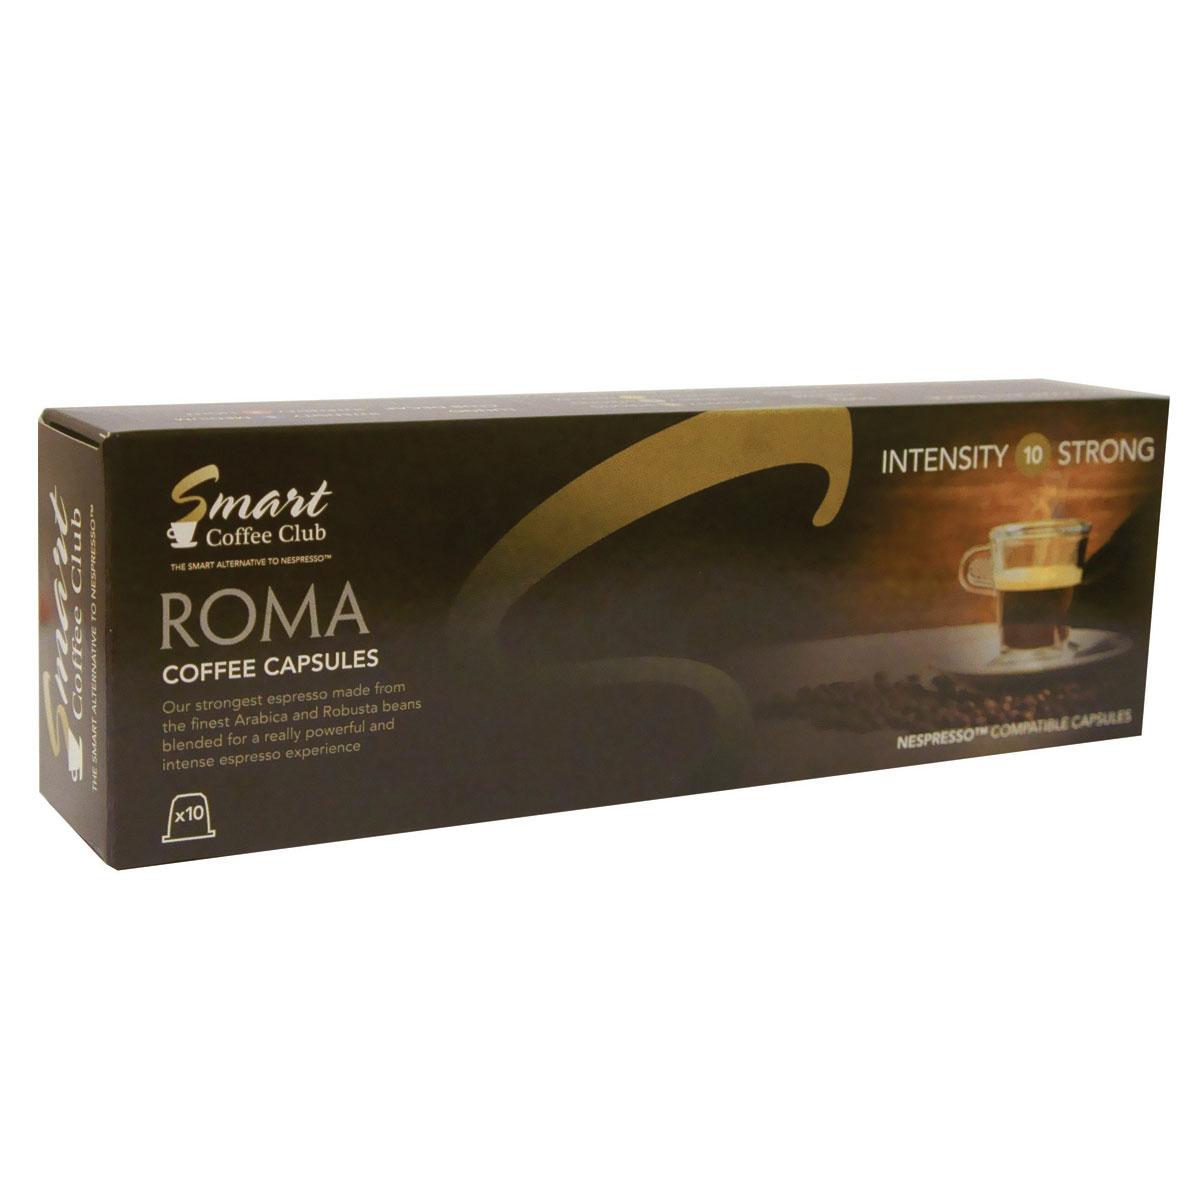 Smart Coffee Club Roma кофе в капсулах, 10 штук кофе в капсулах tassimo карт нуар кафе лонг интенс 128г